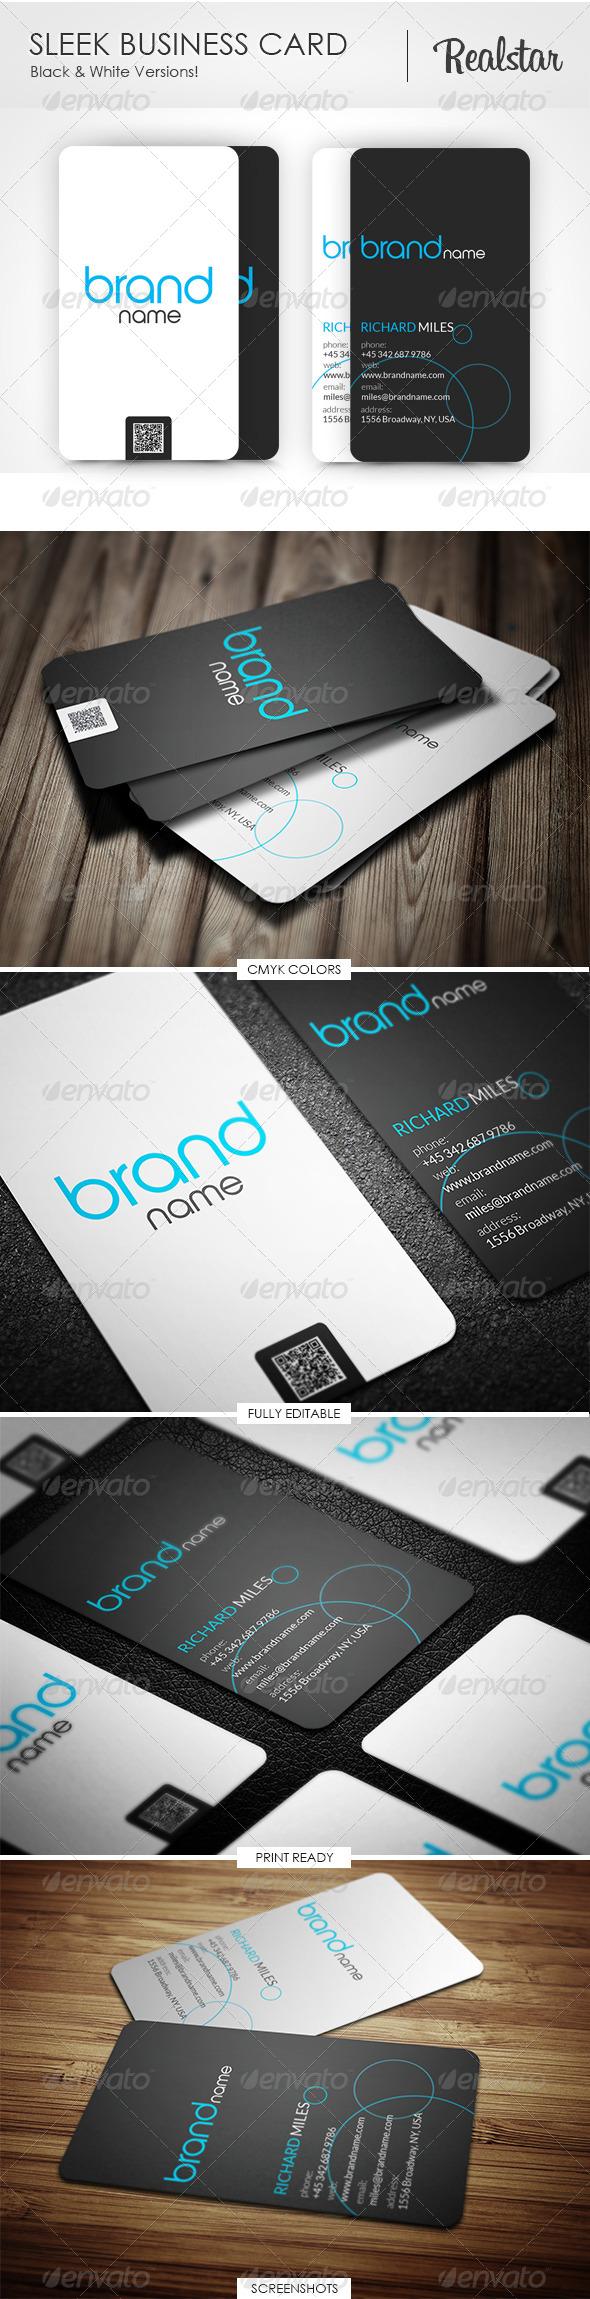 GraphicRiver Sleek Business Card 4541018